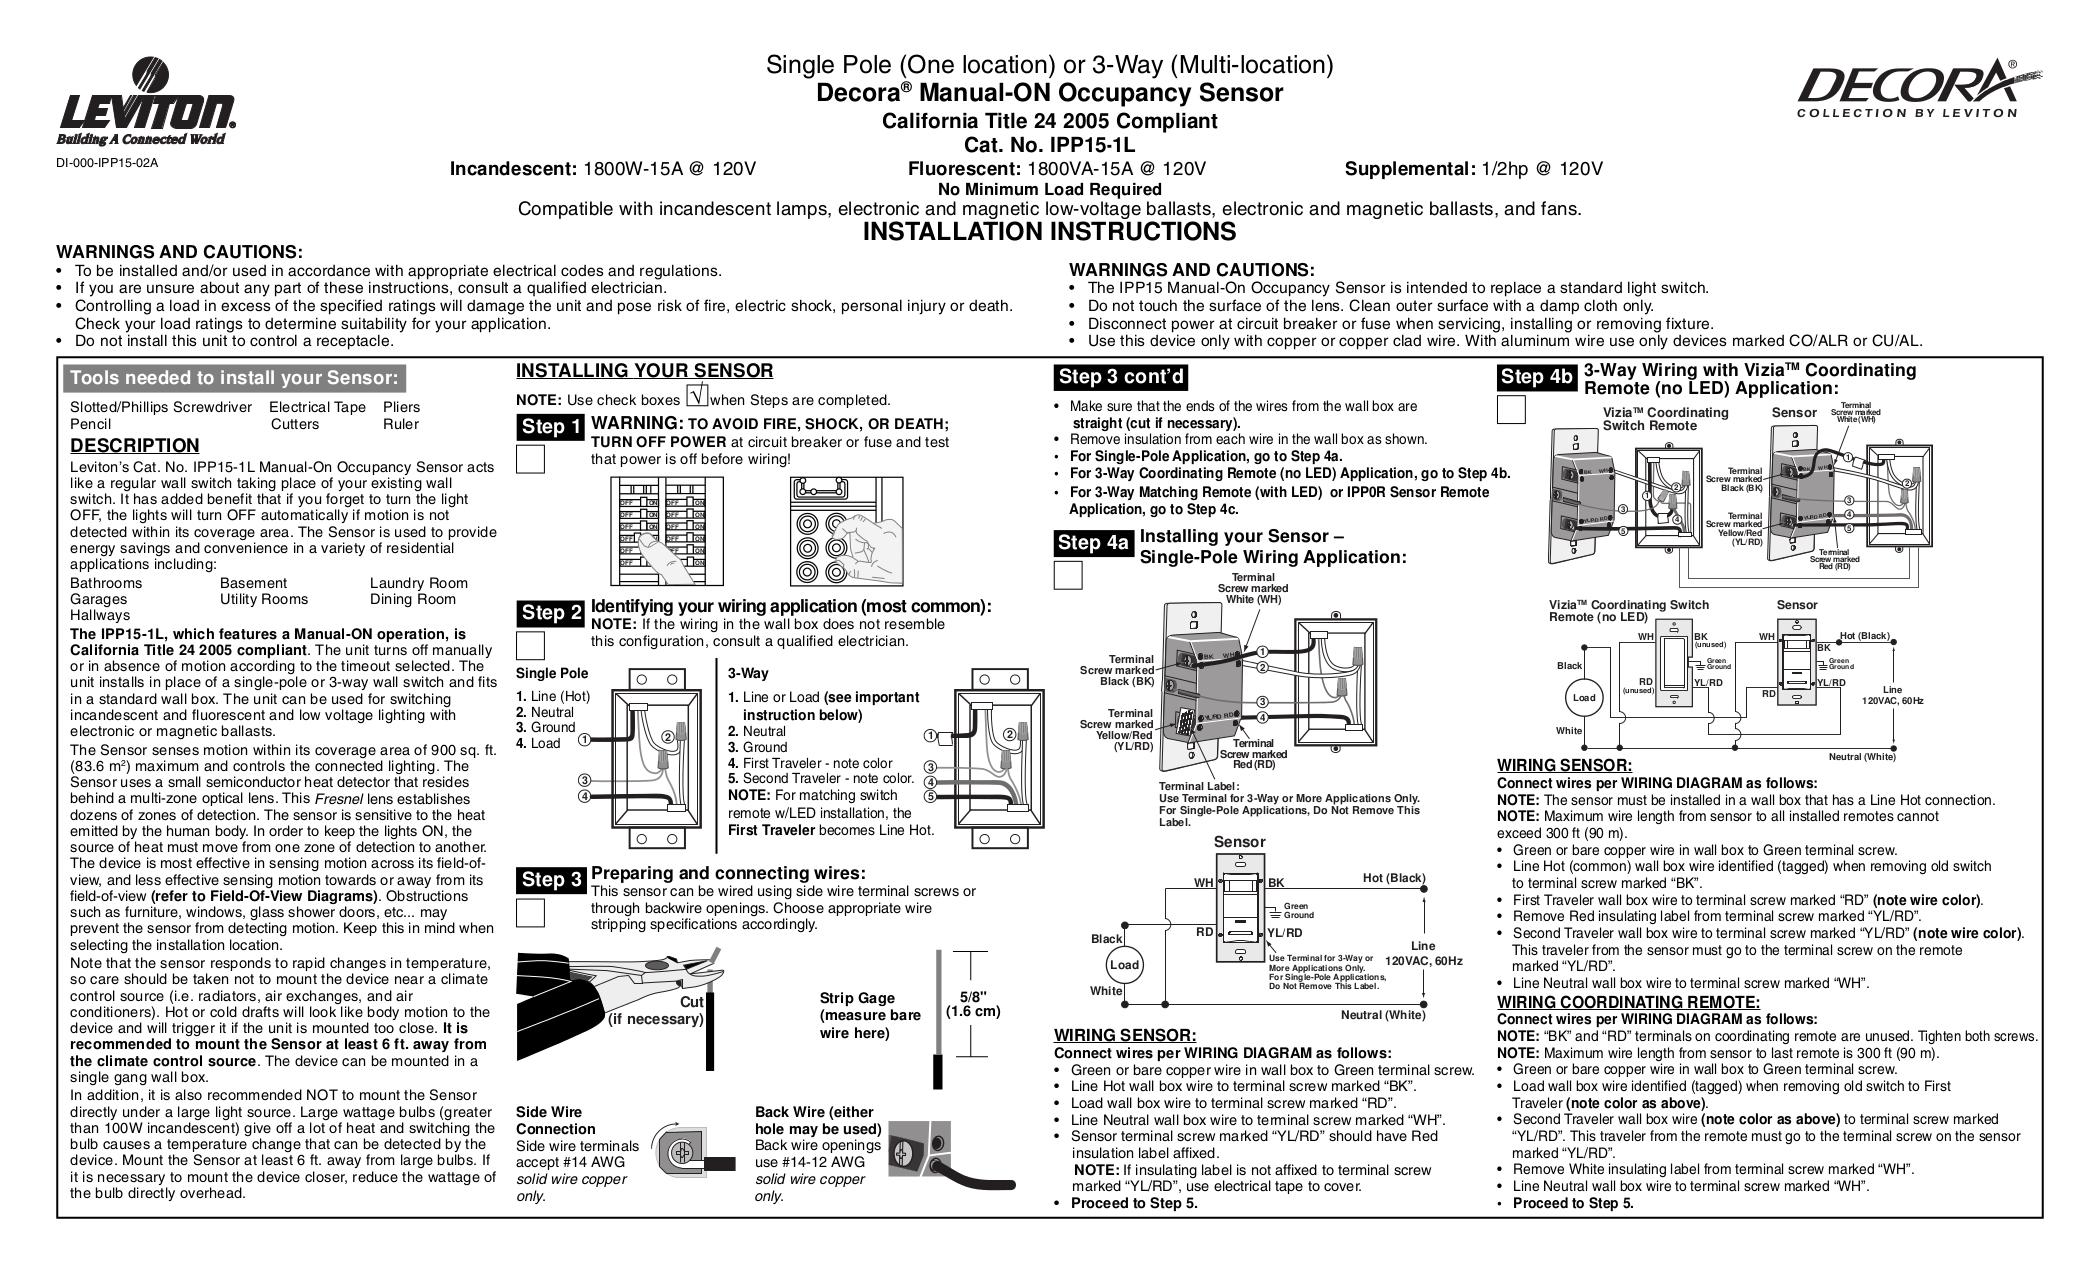 Free Pdf For Leviton Ipp15 1l Occupancy Sensor Other Manual Rh Umlib Com  Sensors Lighting Ceiling